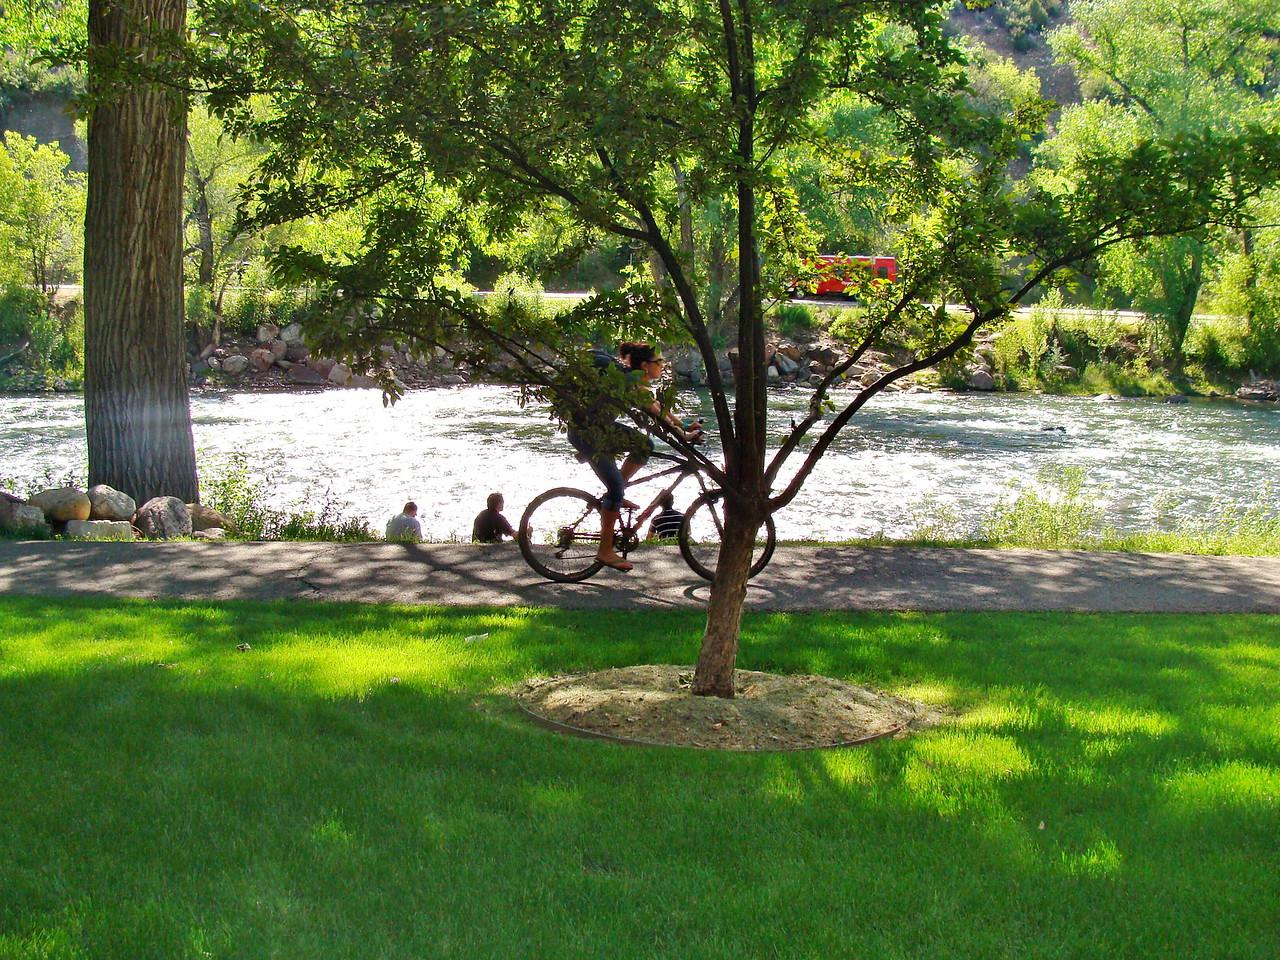 Biking the Animas River Trail